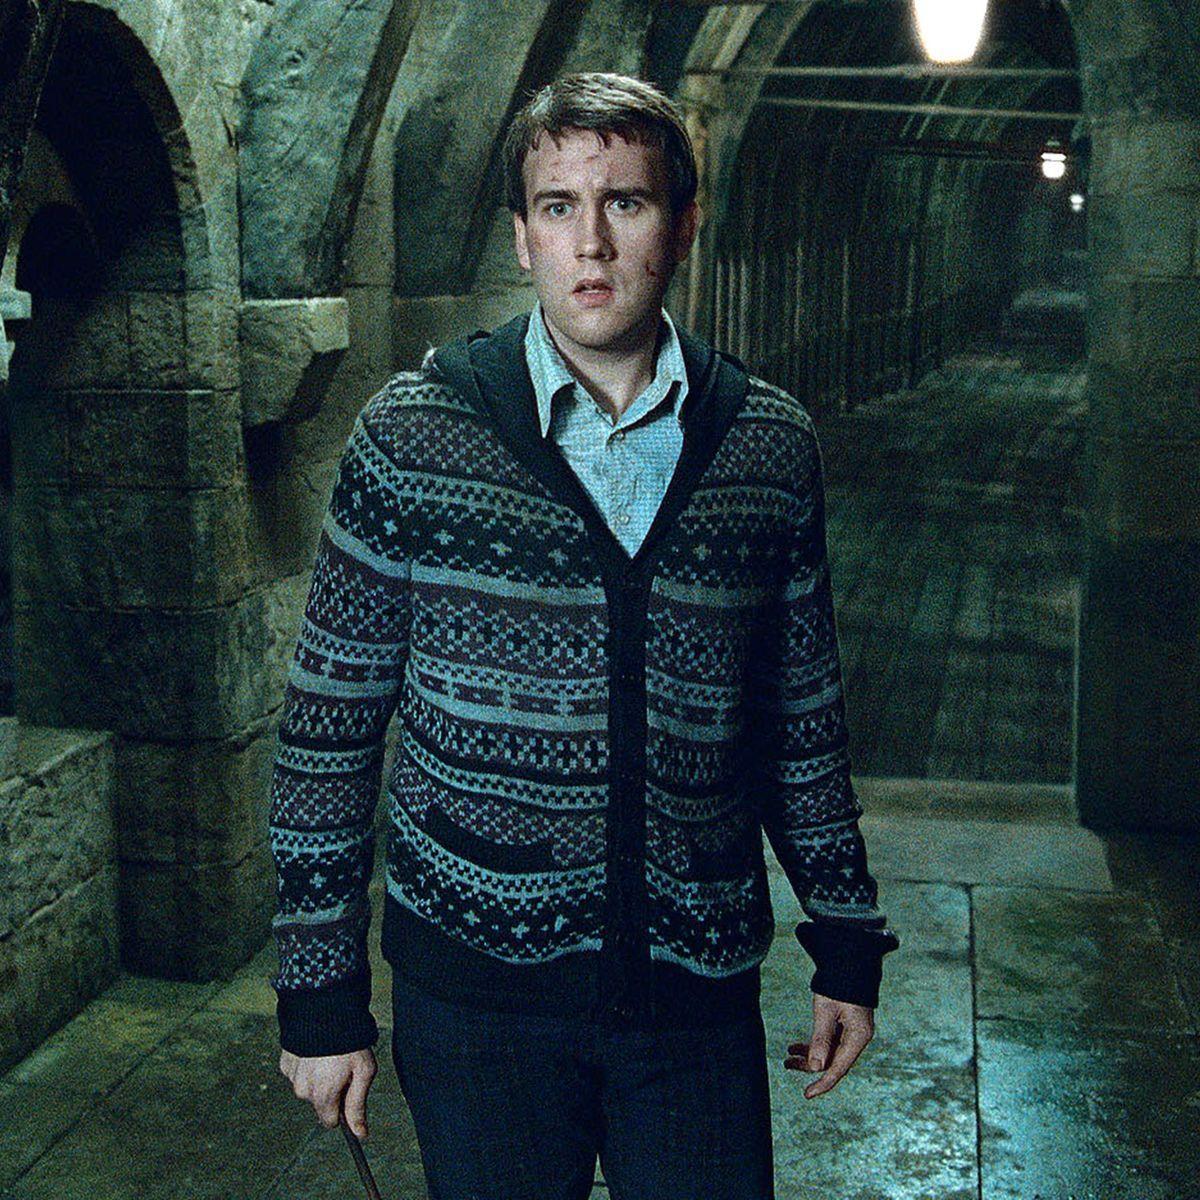 Neville Longbottom Harry Potter And The Deathly Hallows Pt 2 Longbottom Harry Potter Harry Potter Neville Neville Longbottom